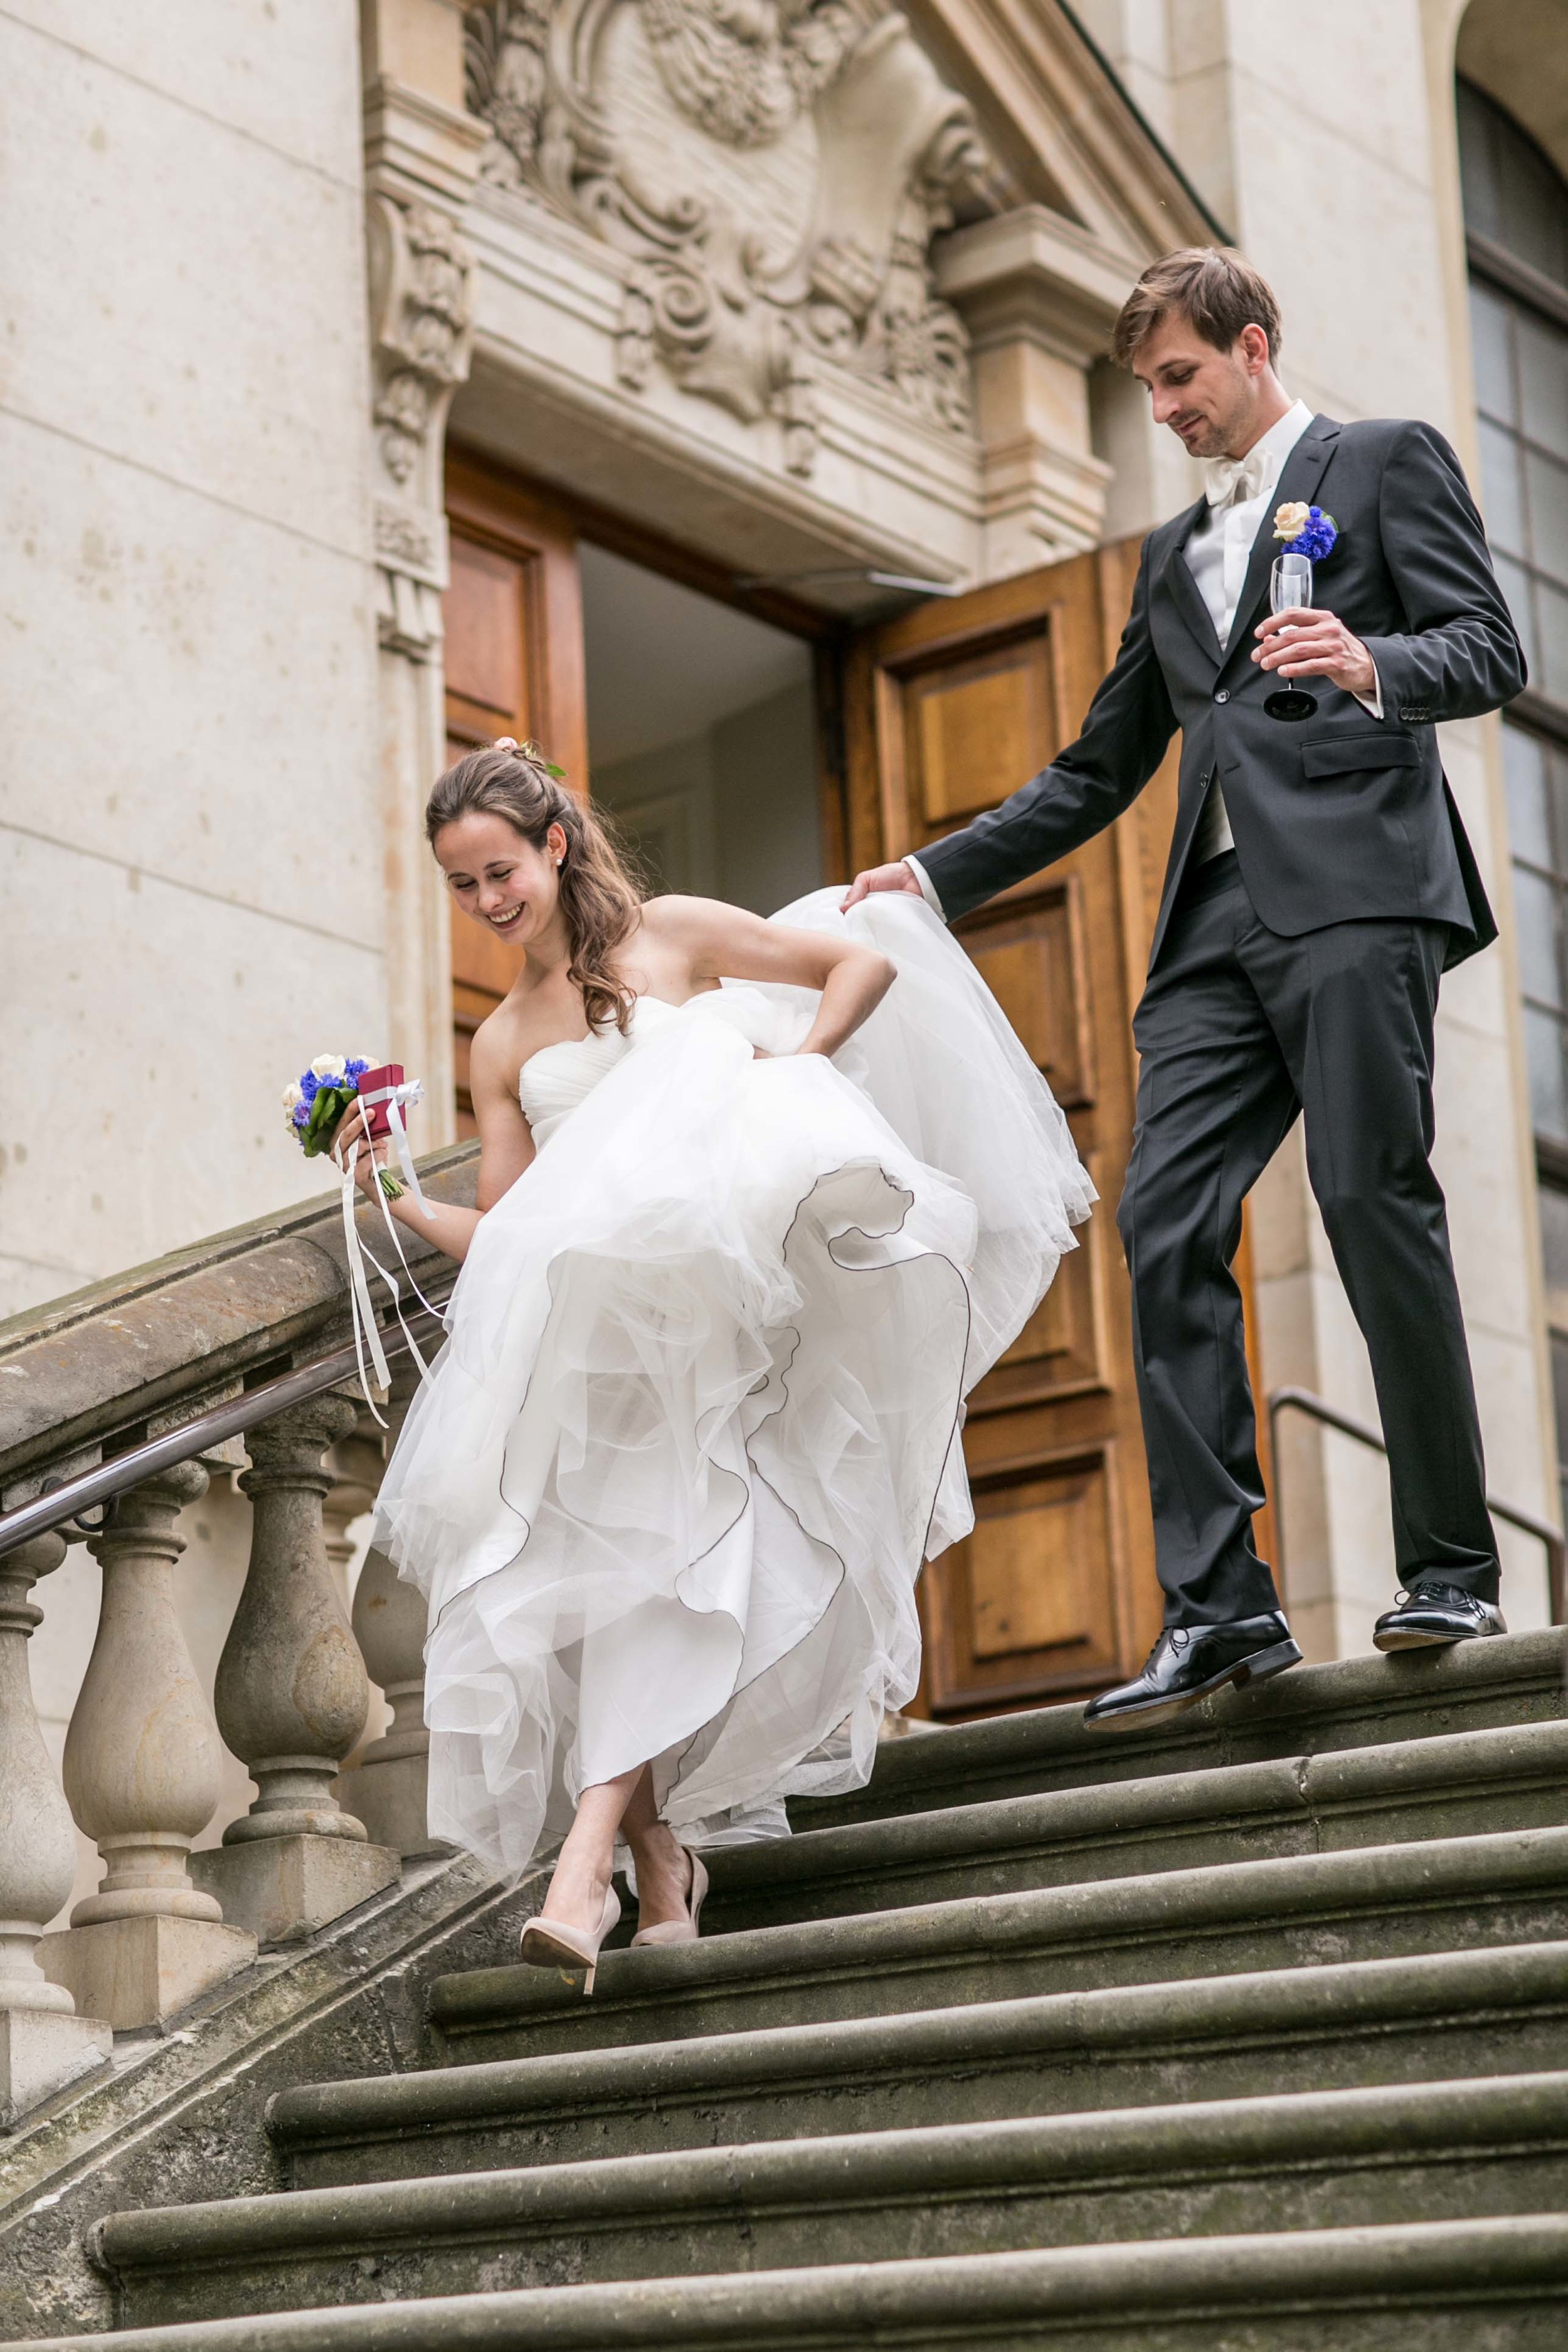 Berlin Hochzeitsfotografie_Fran Burrows Fotografie-15.jpg